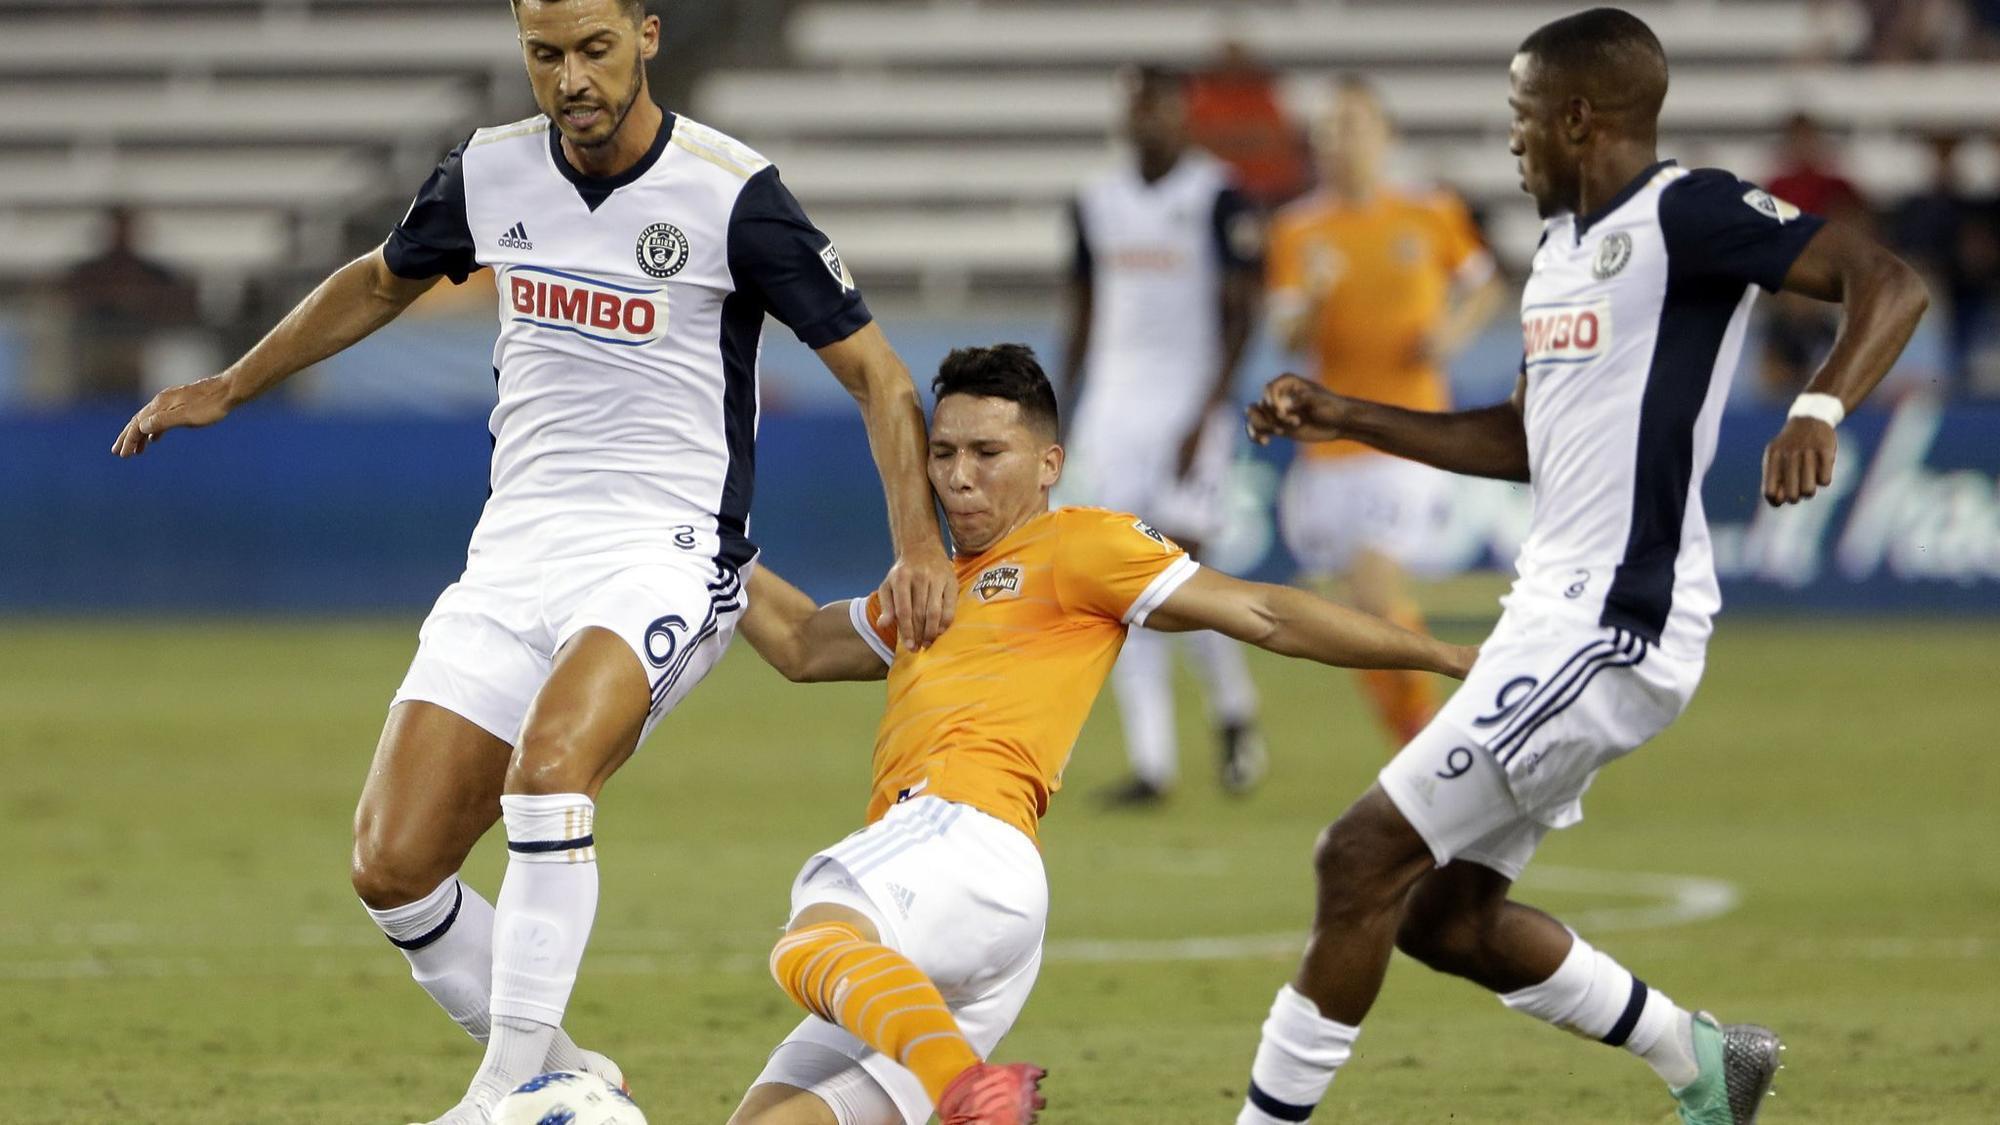 Burke's goal secures Union late win over Houston Dynamo